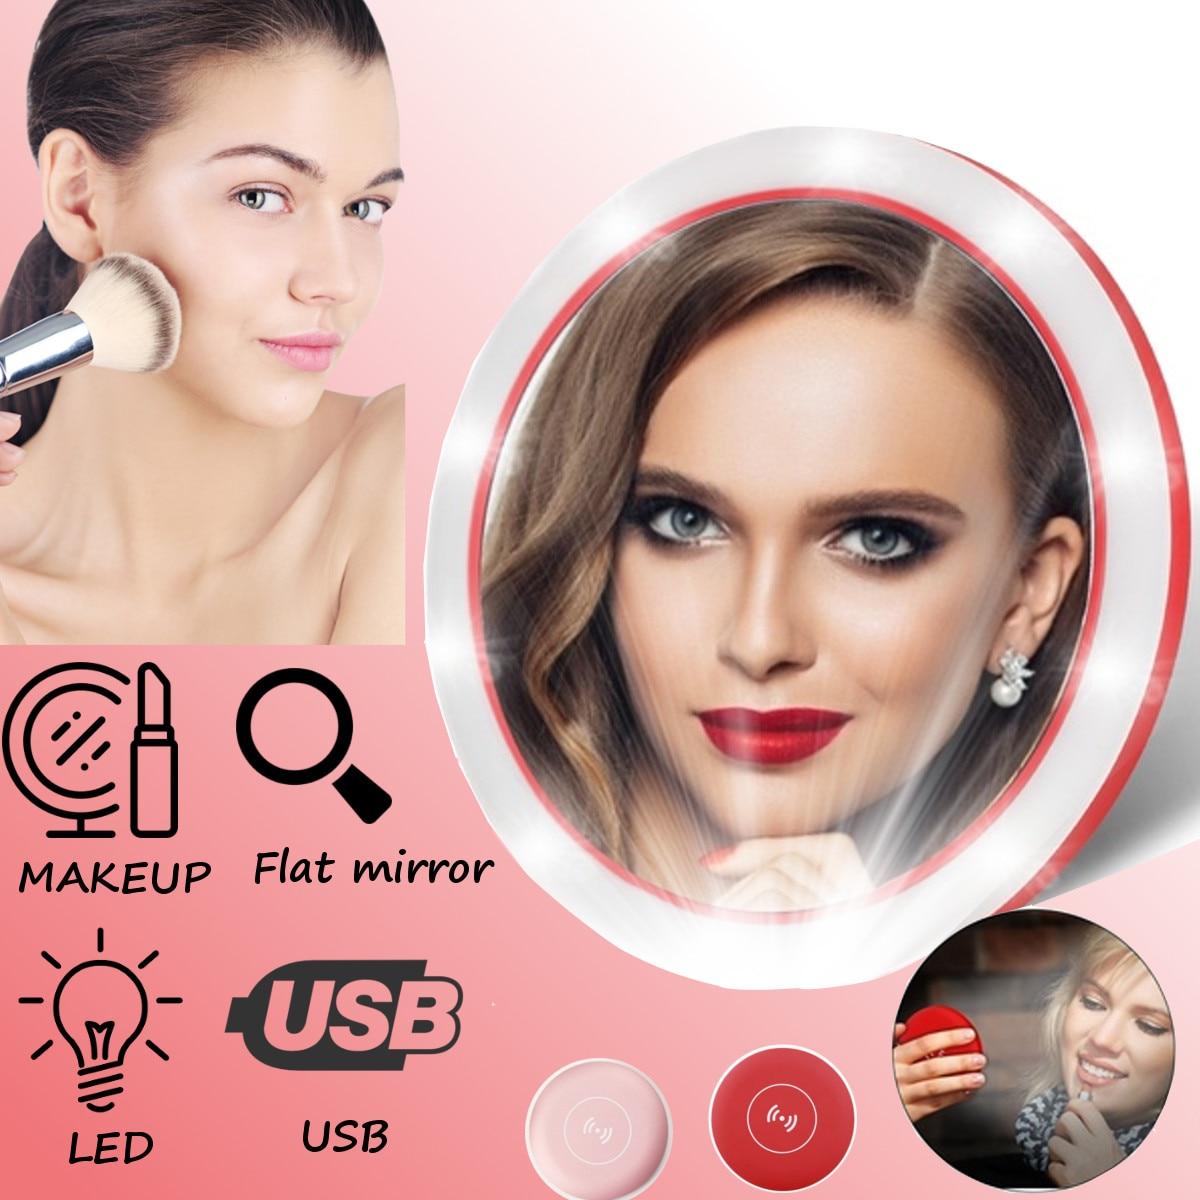 Tragbare LED Beleuchtete Mini Rund Make-Up Spiegel Compact Travel Sensing Beleuchtung Kosmetik Spiegel Wireless USB Lade